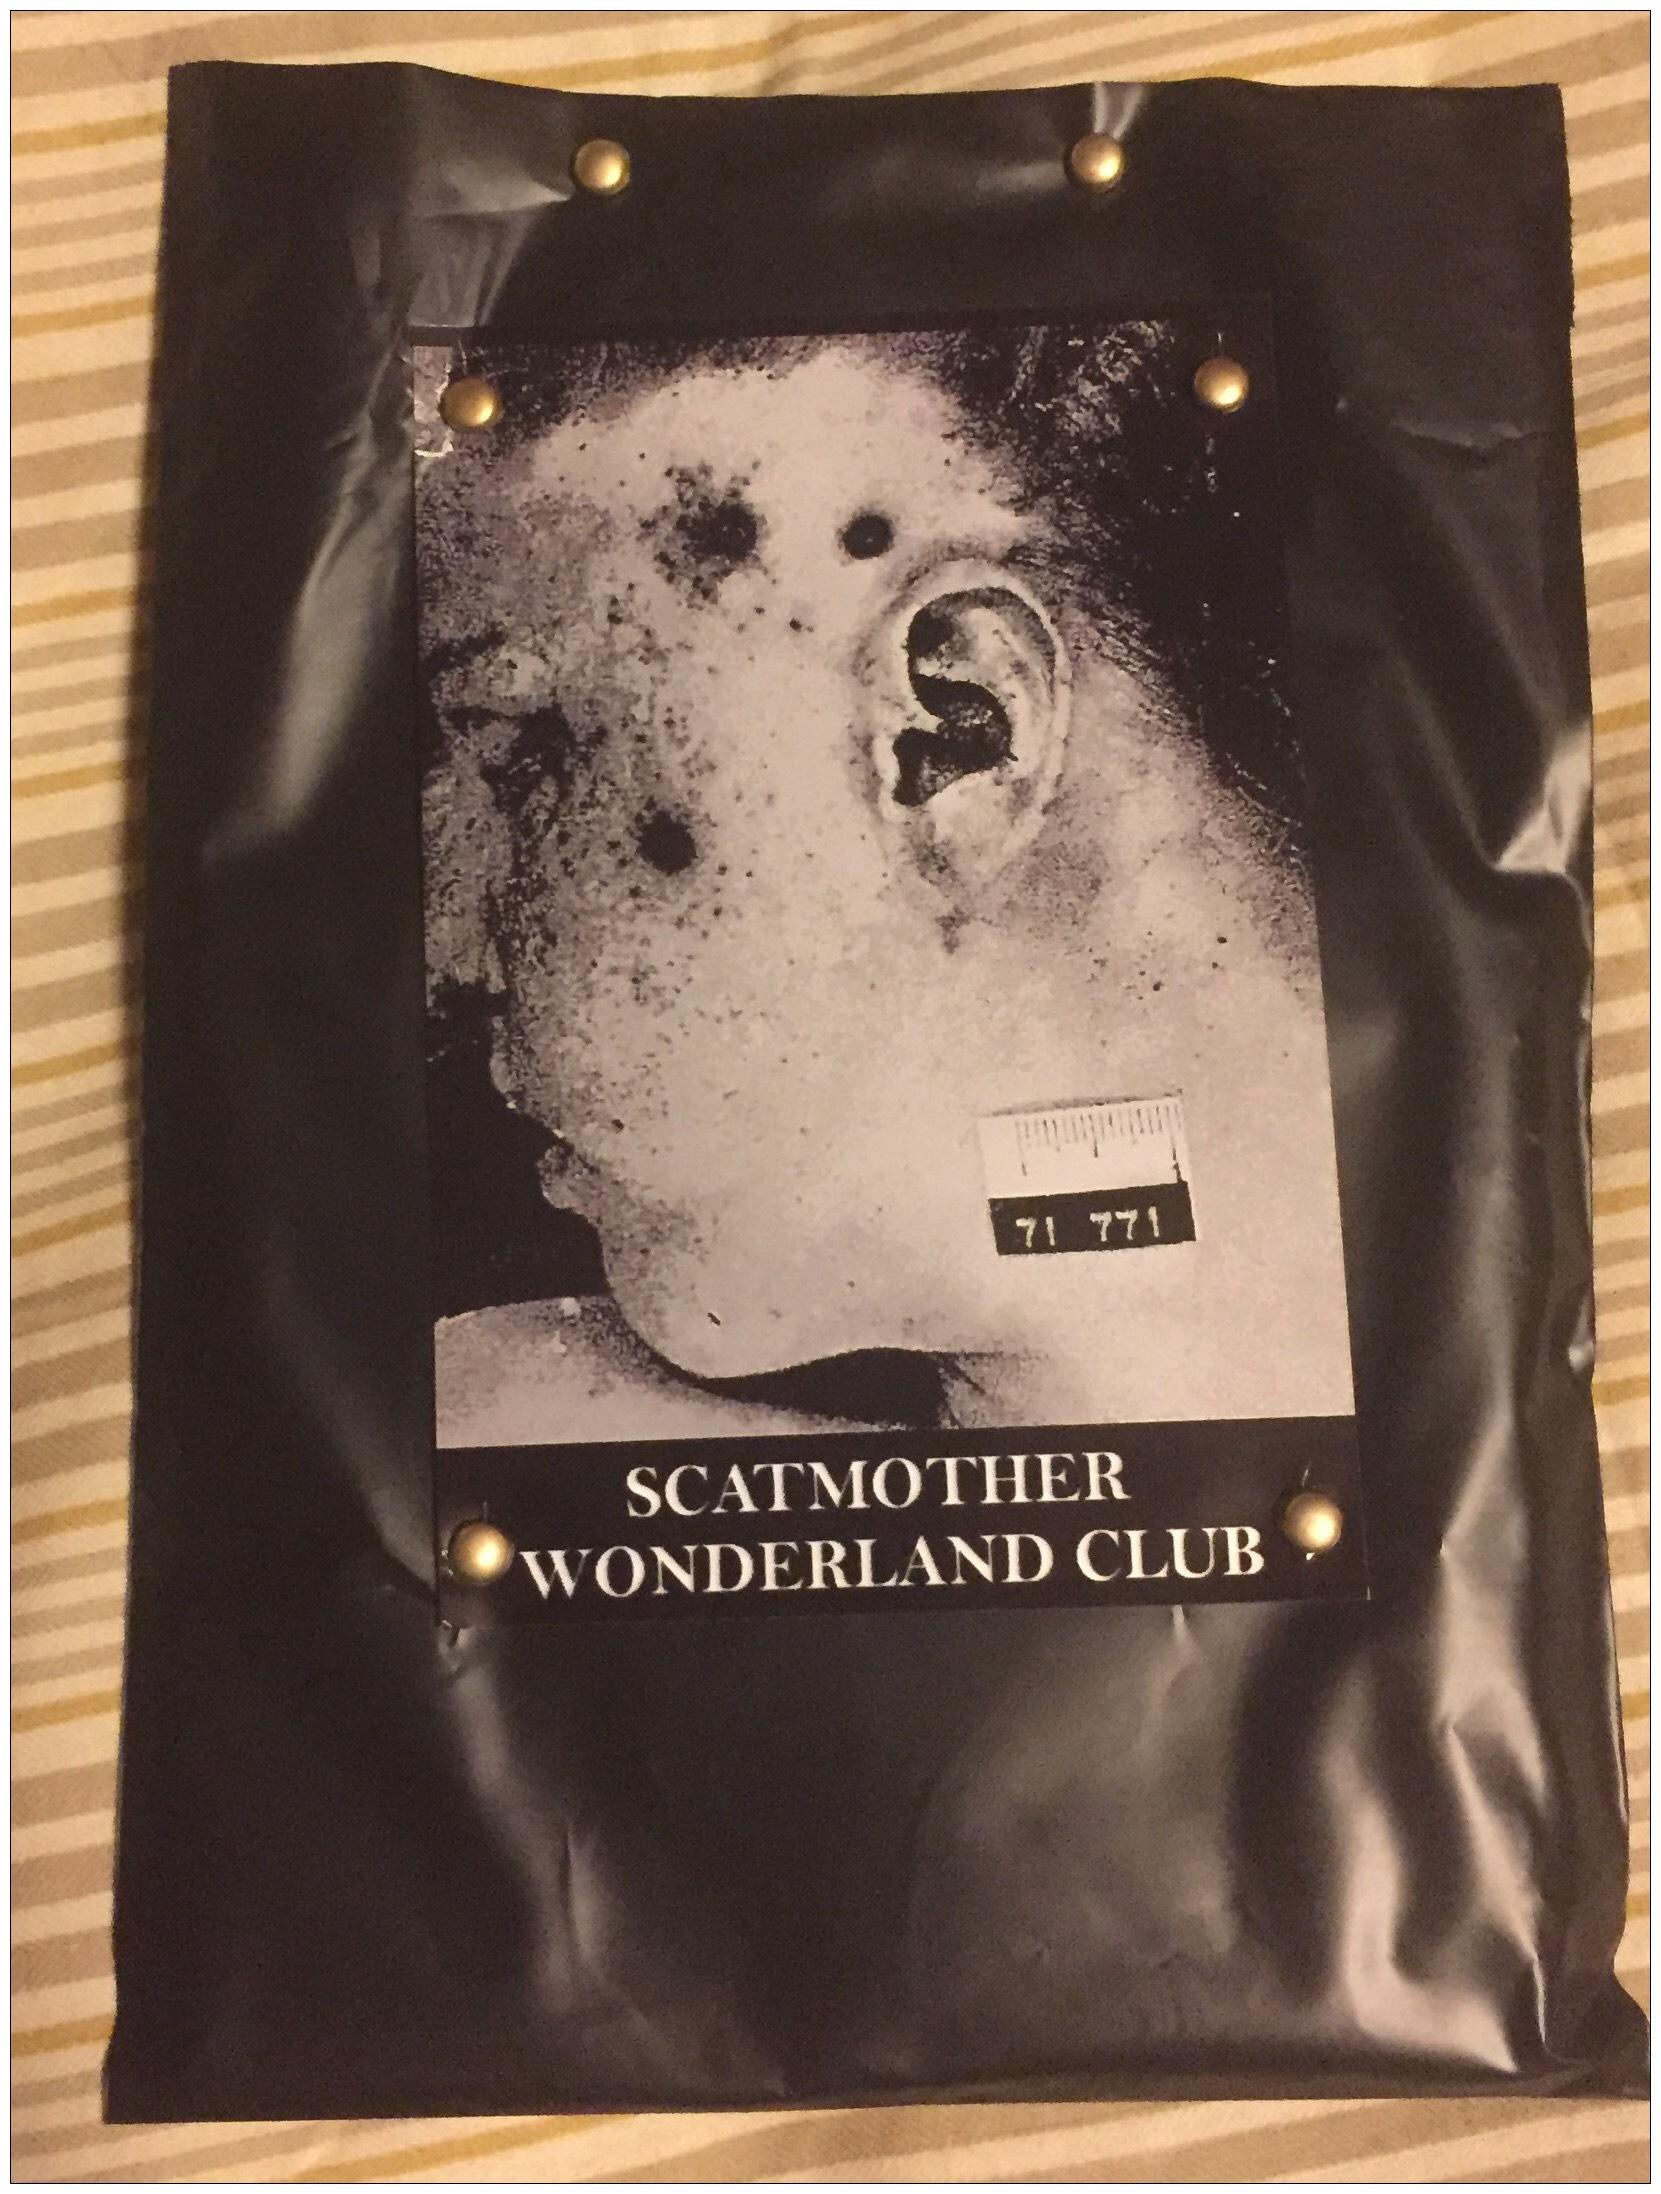 Scatmother / Wonderland Club  - Split  Tape - 画像1